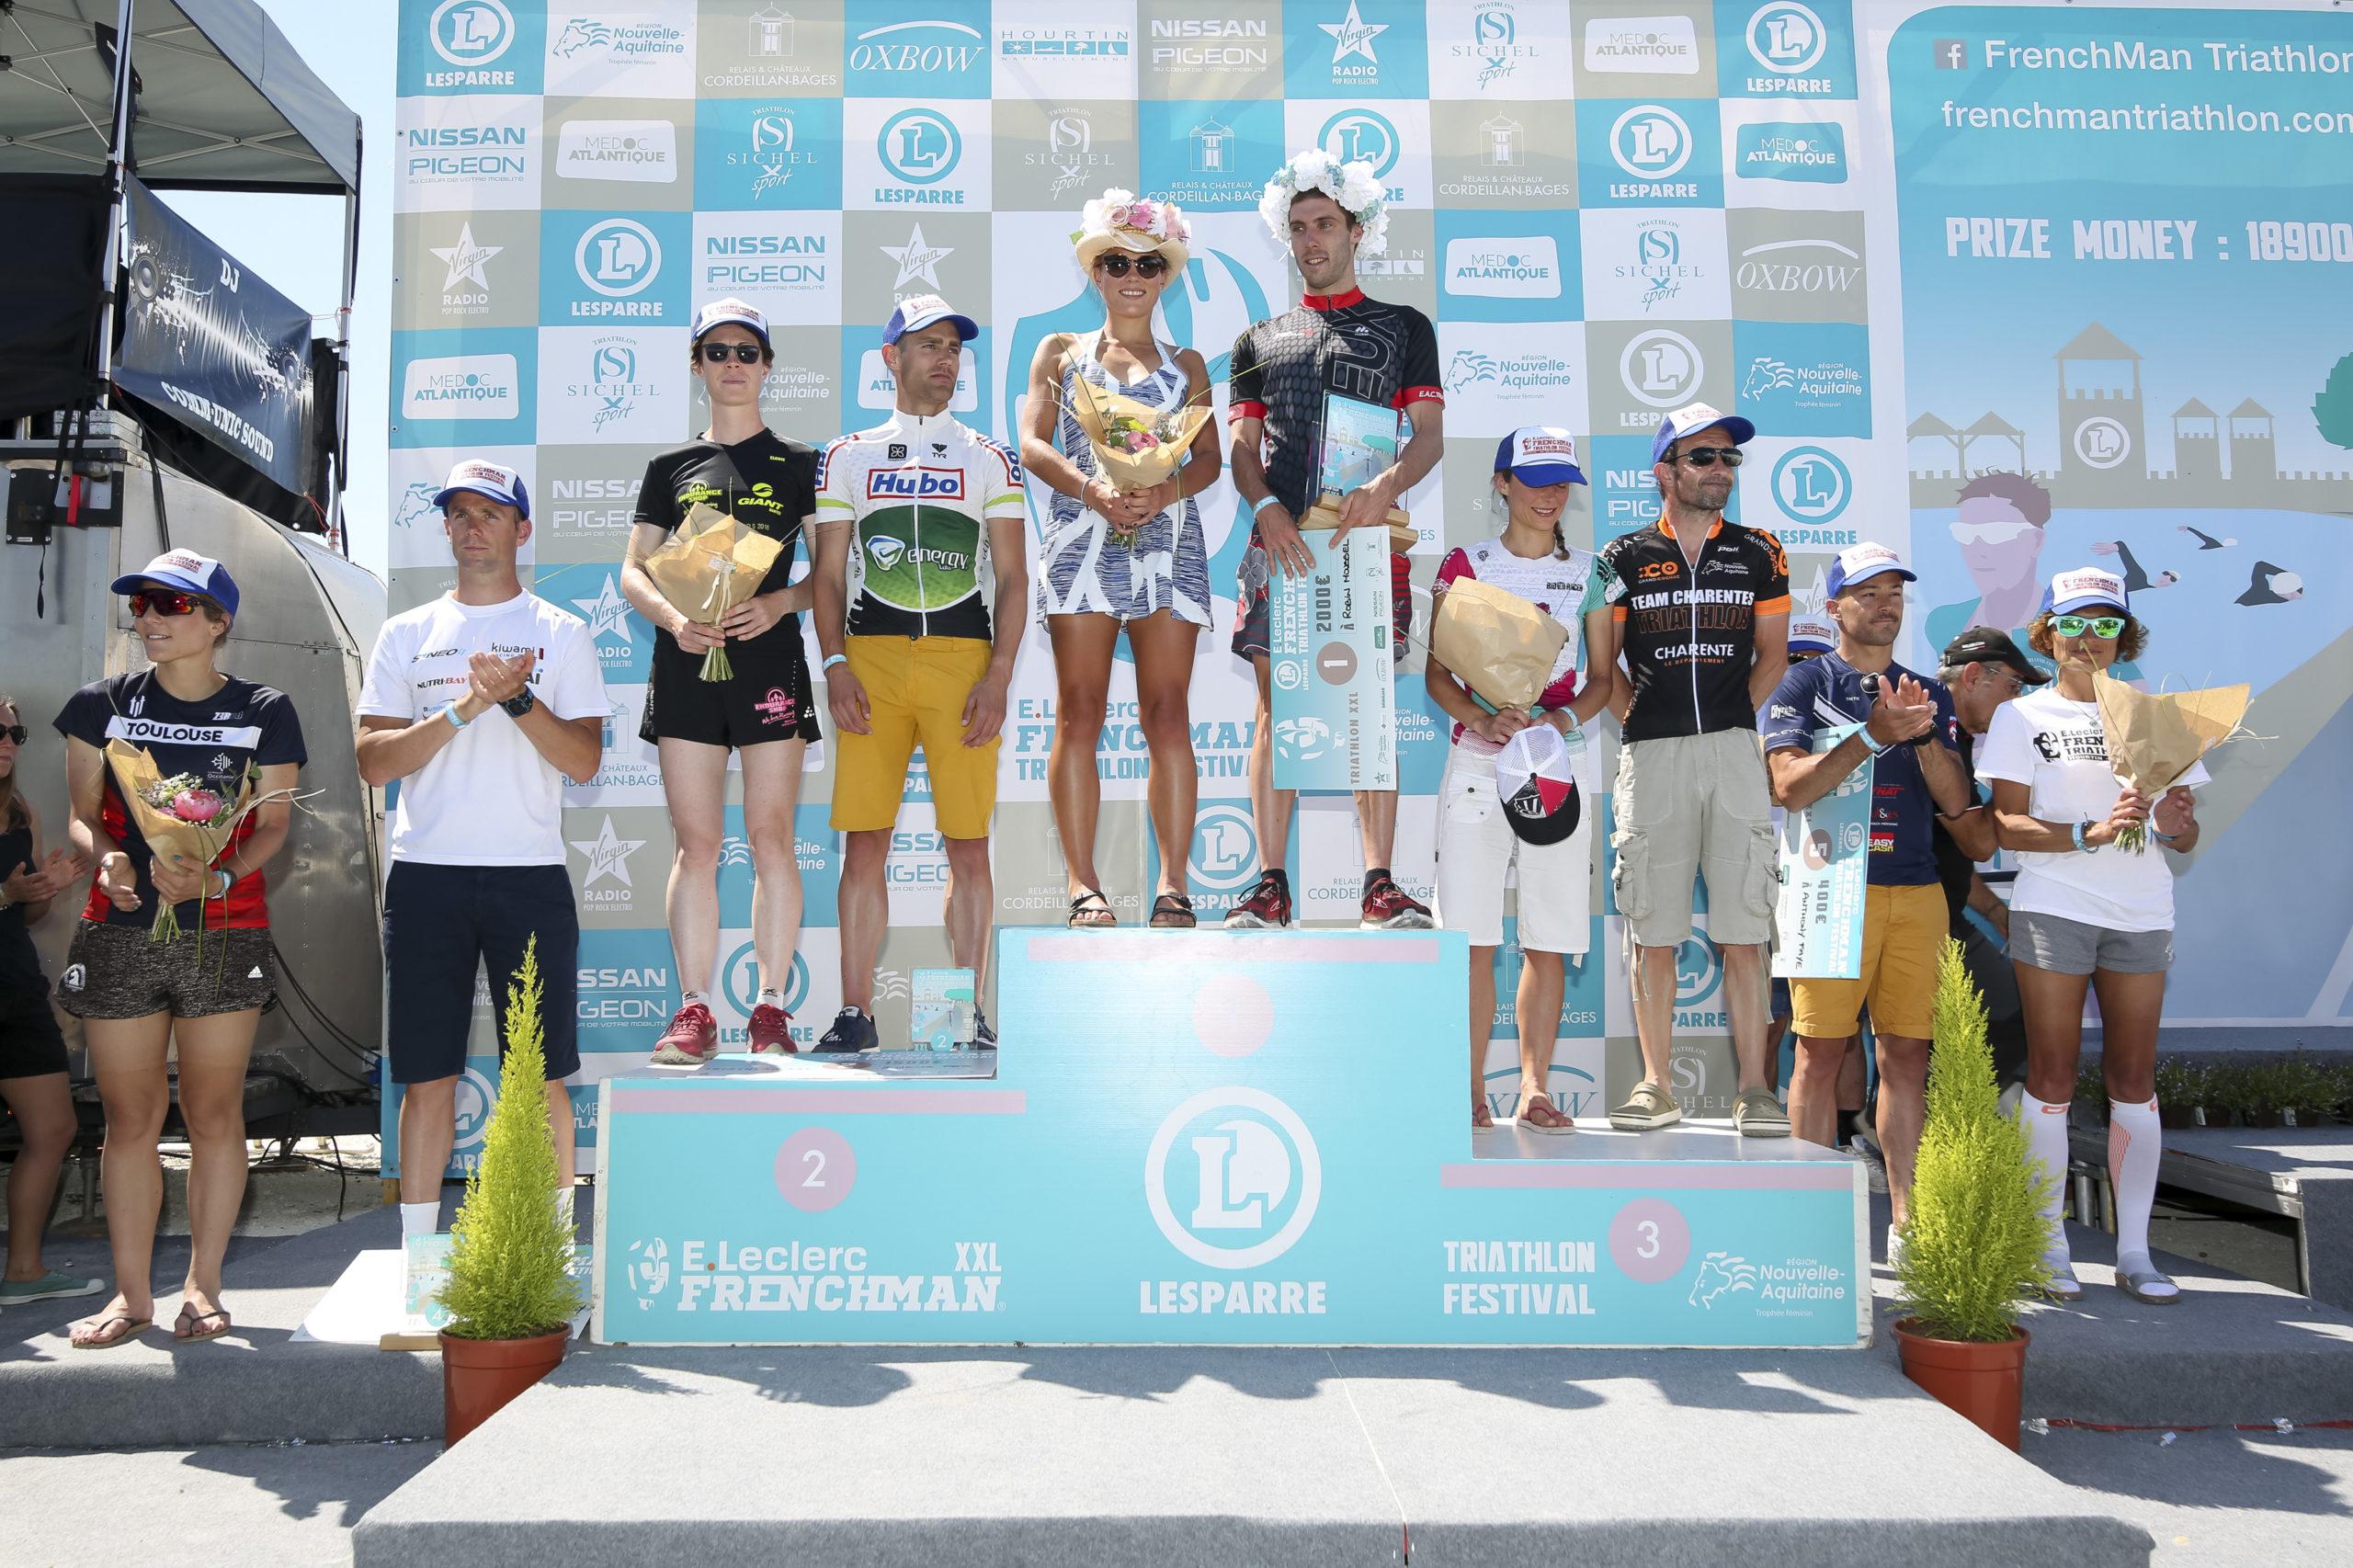 frenchman-triathlon-xxl-2019-podiums-sebastien-huruguen-hourtin-19-scaled